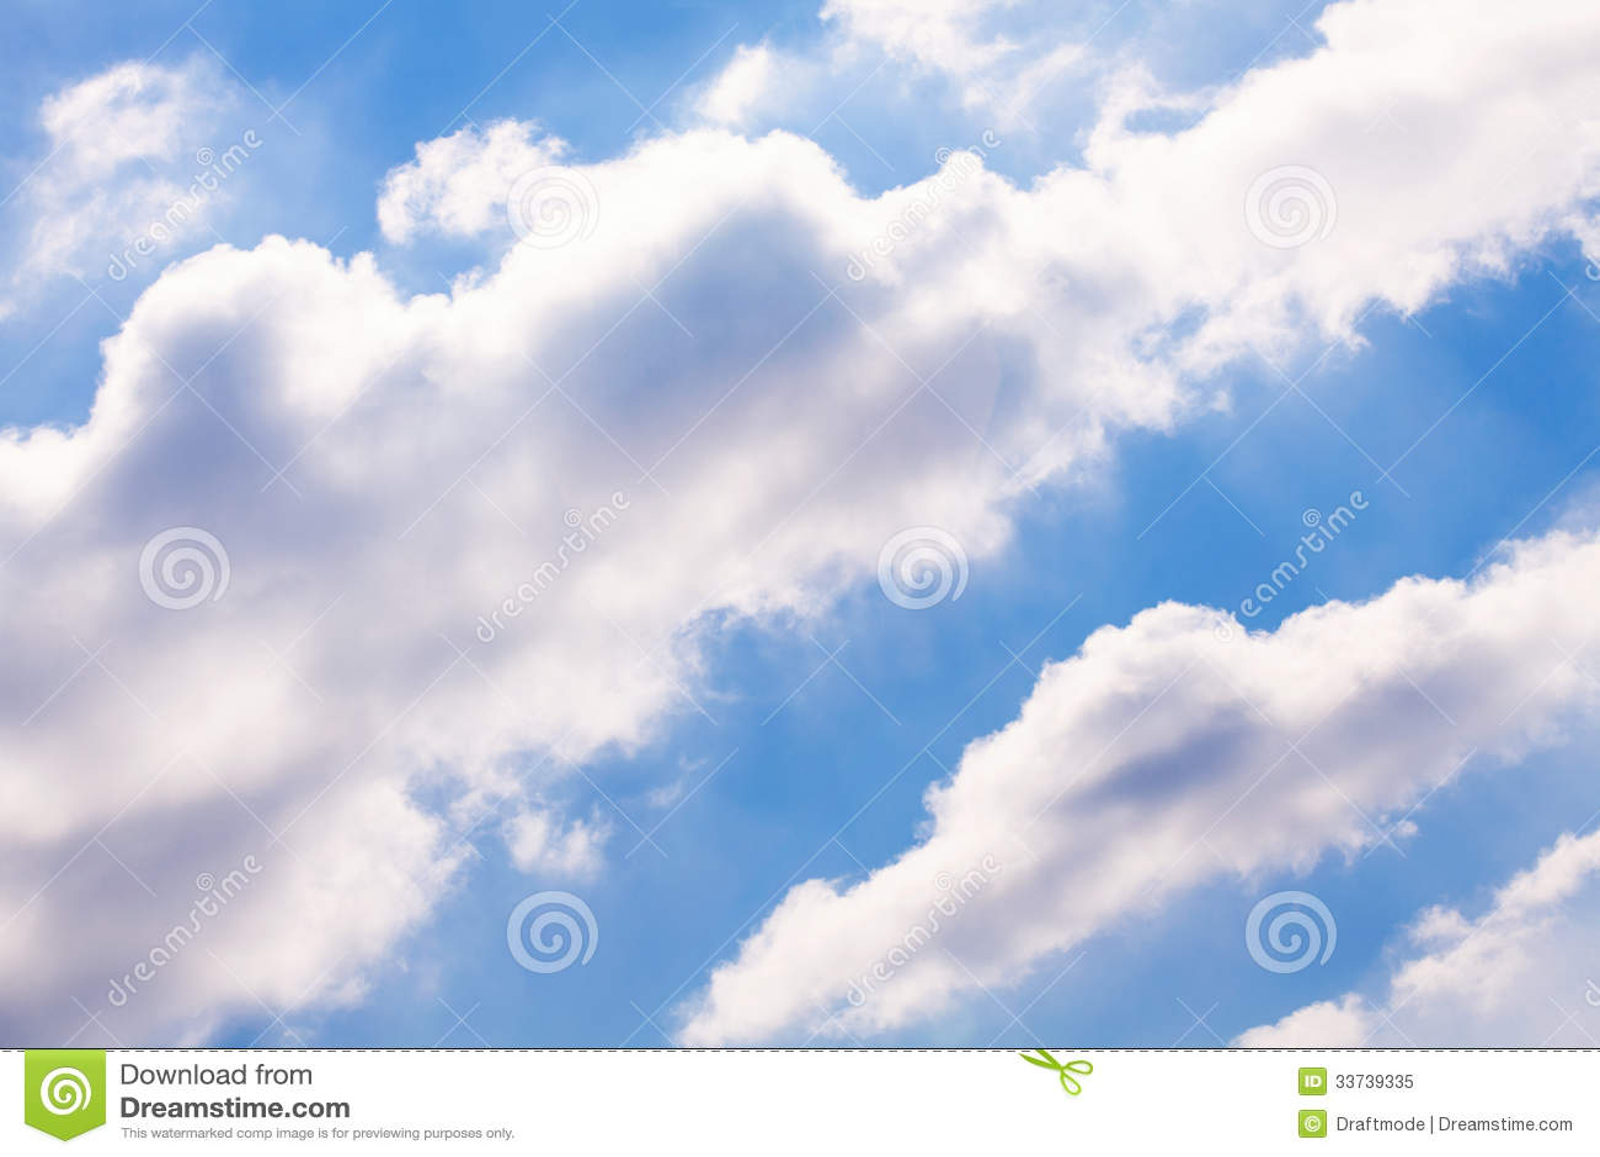 Тучные облака